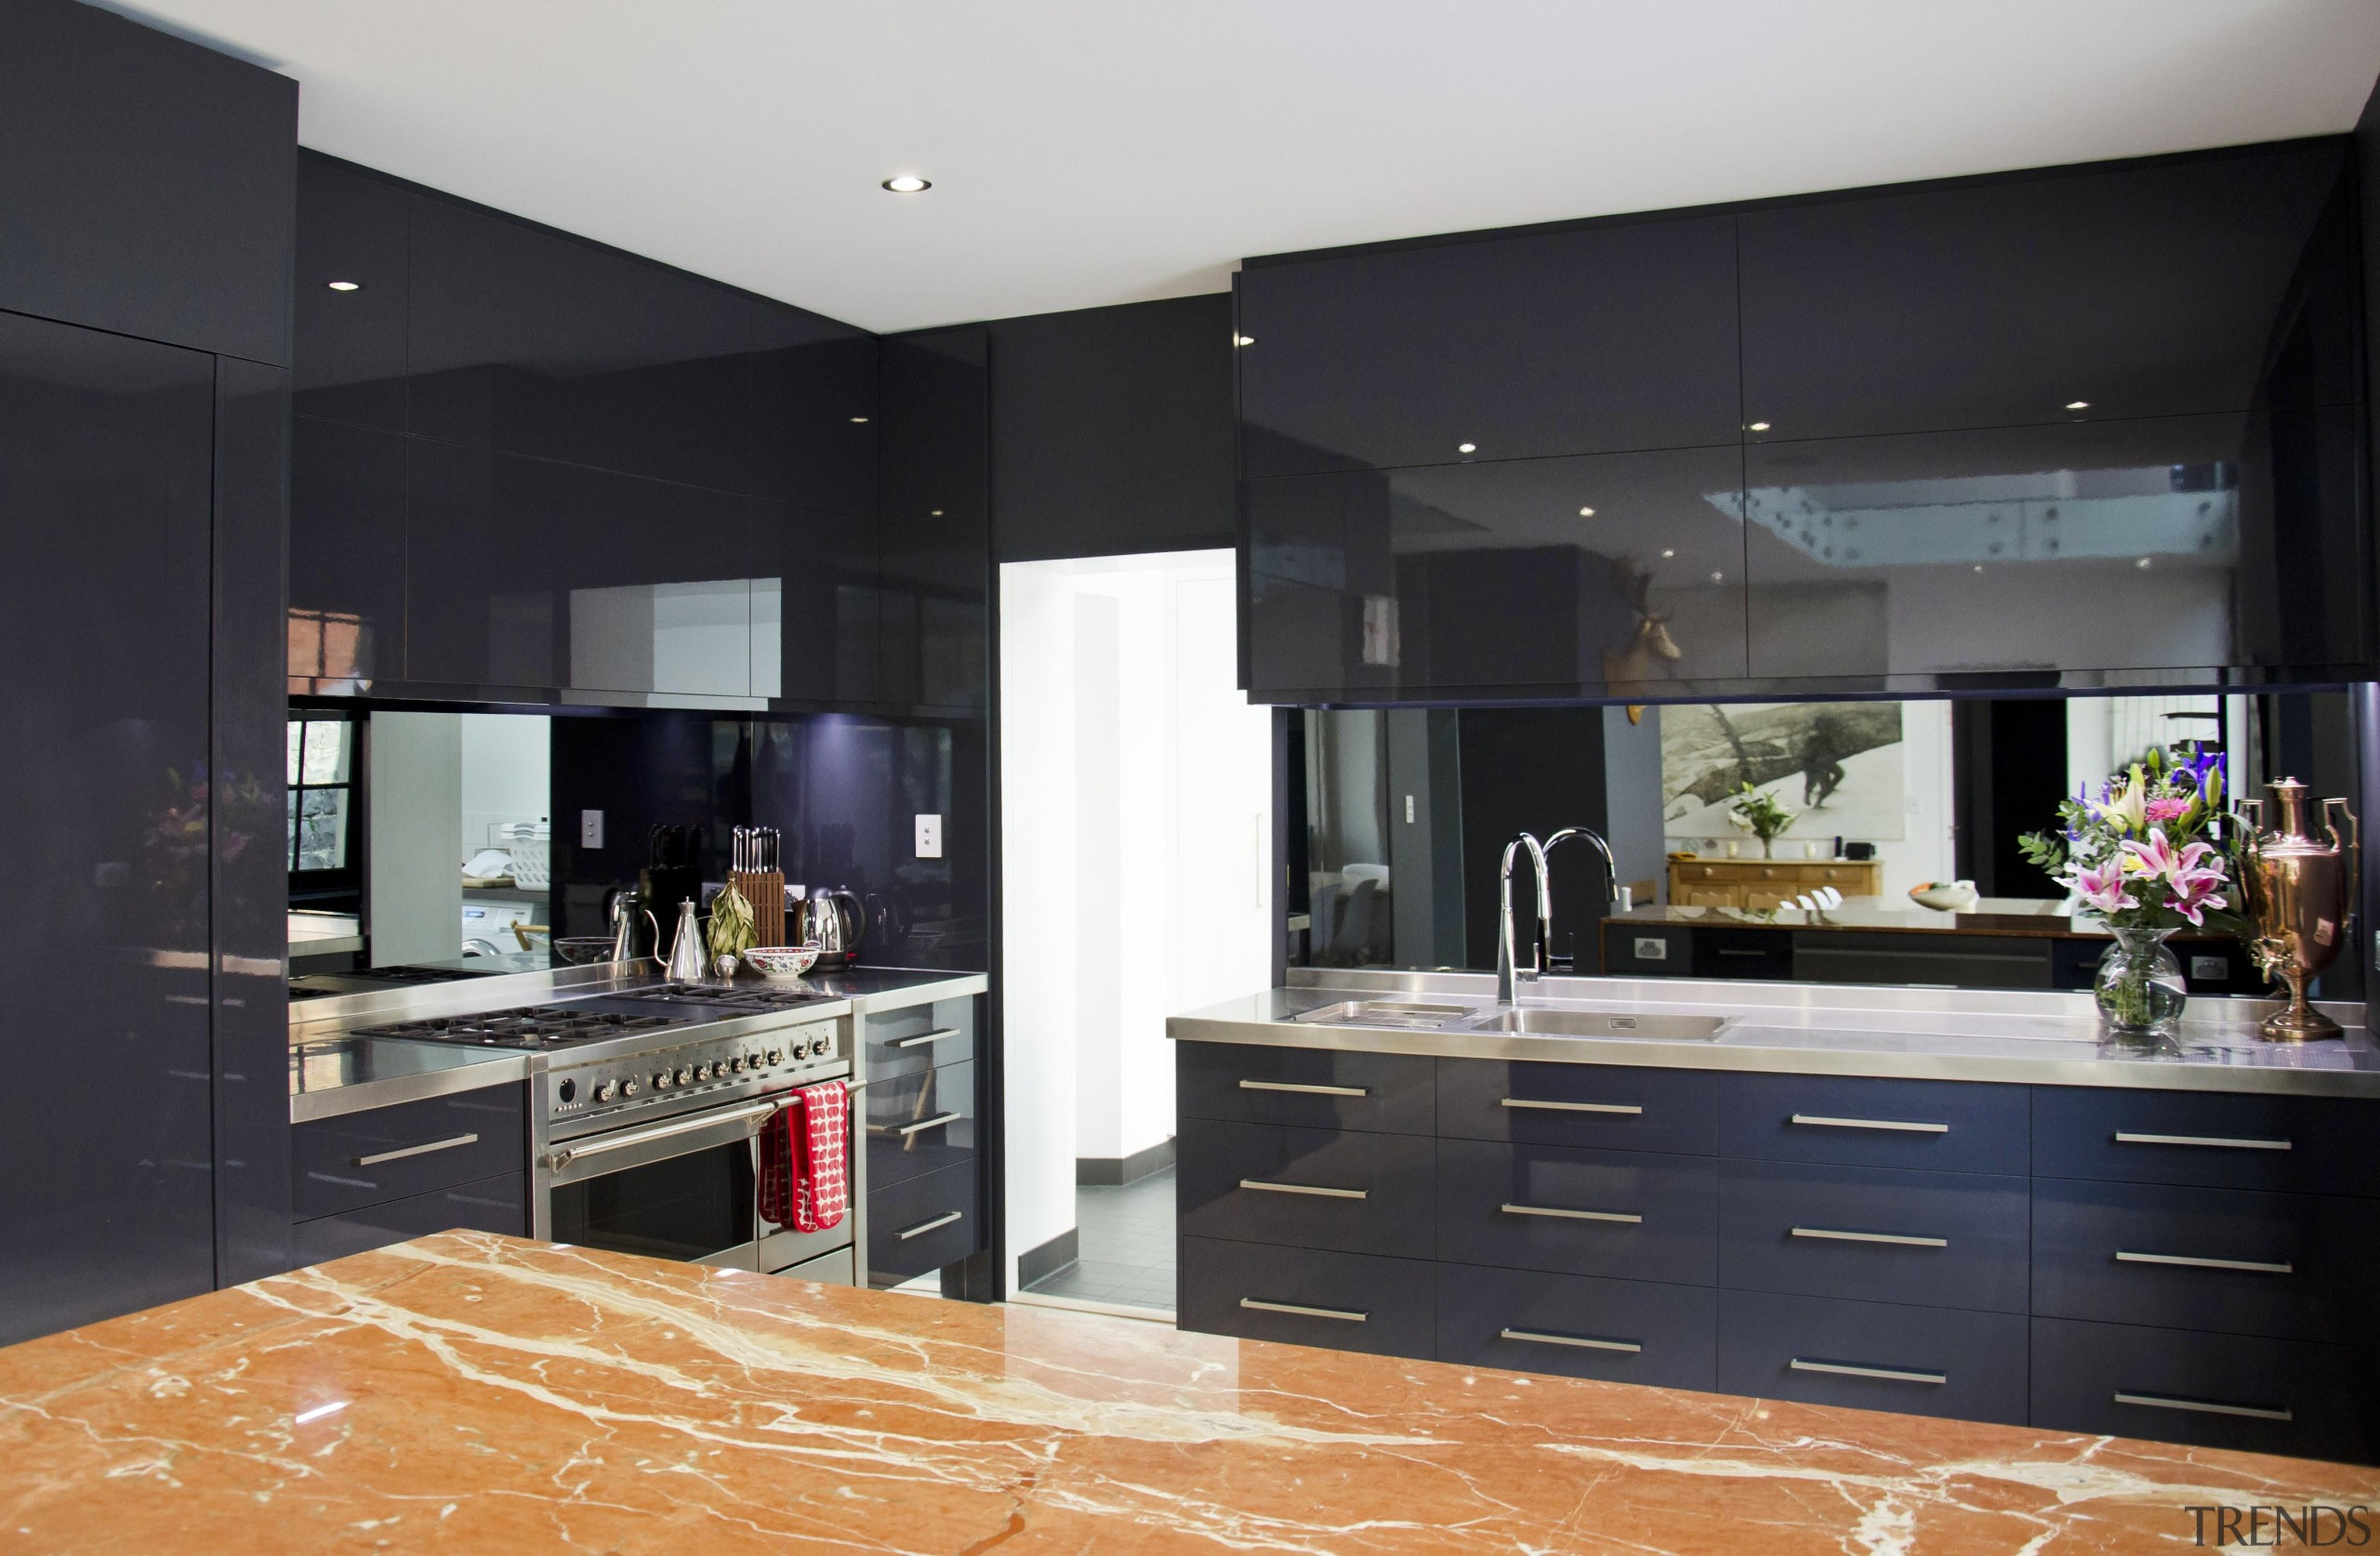 Winner Kitchen of the Year 2013 Tasmania Region cabinetry, countertop, cuisine classique, floor, flooring, interior design, kitchen, real estate, room, black